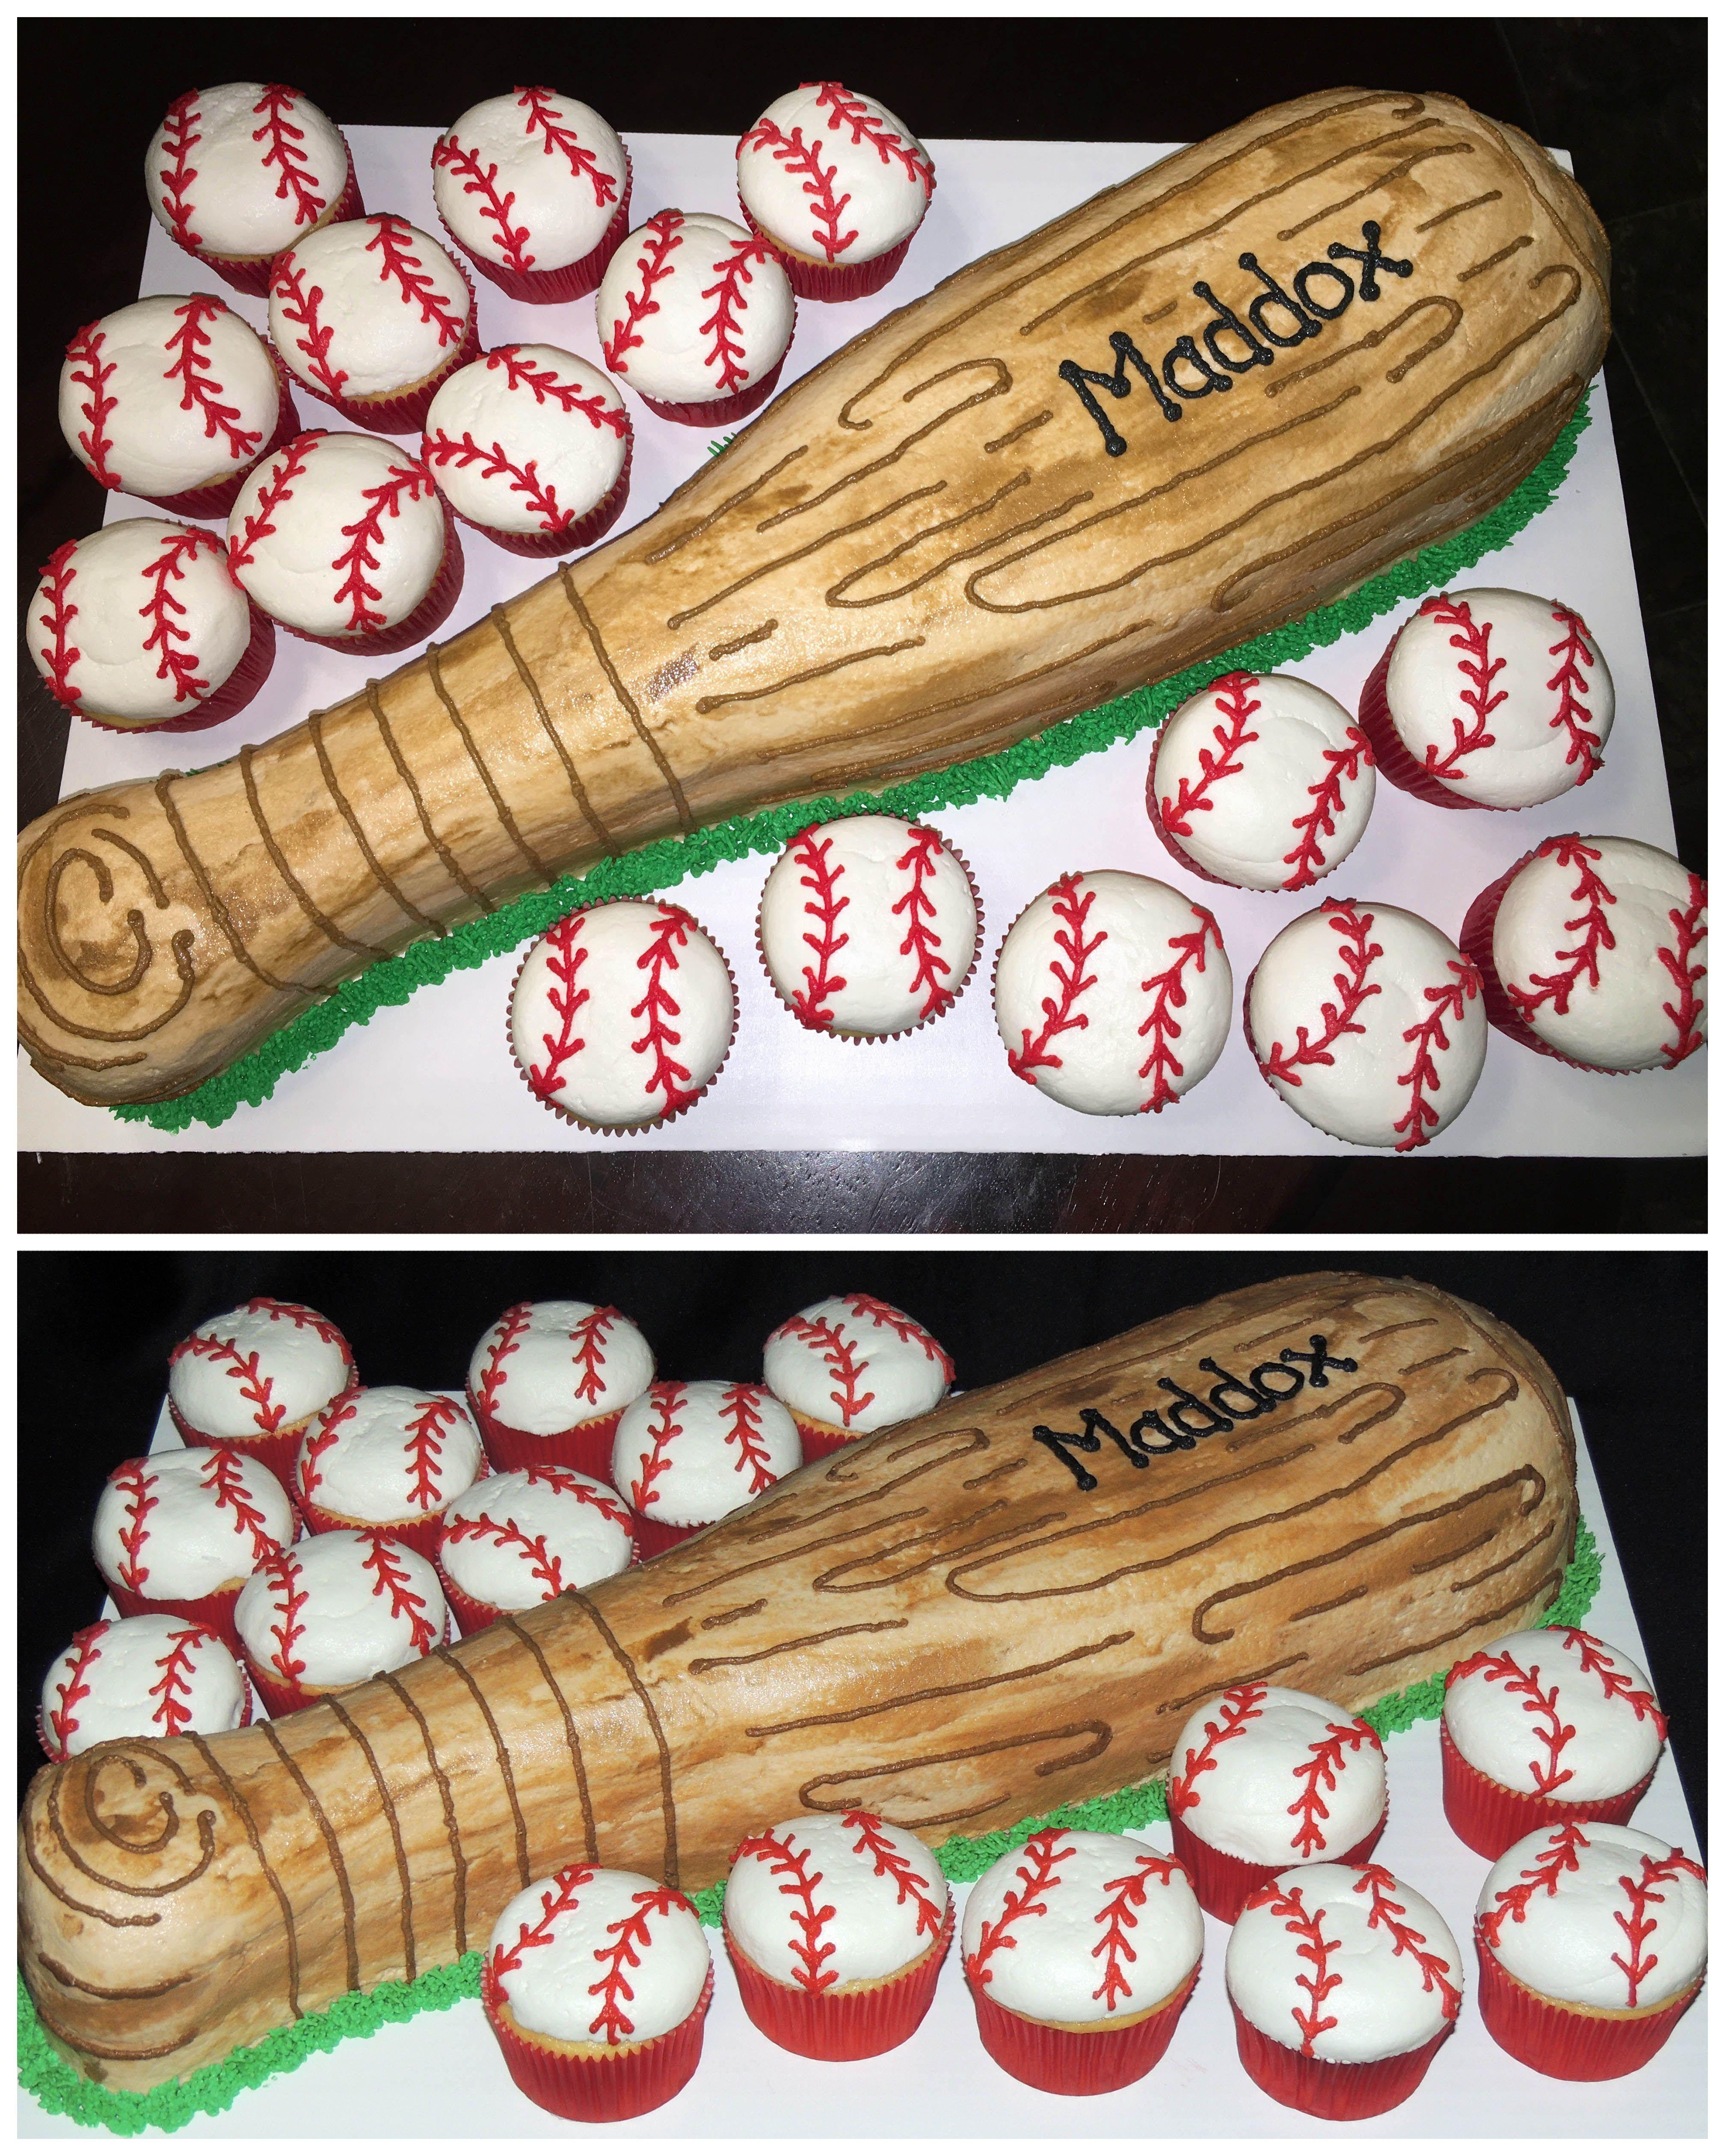 Make Baseball Bat Cake